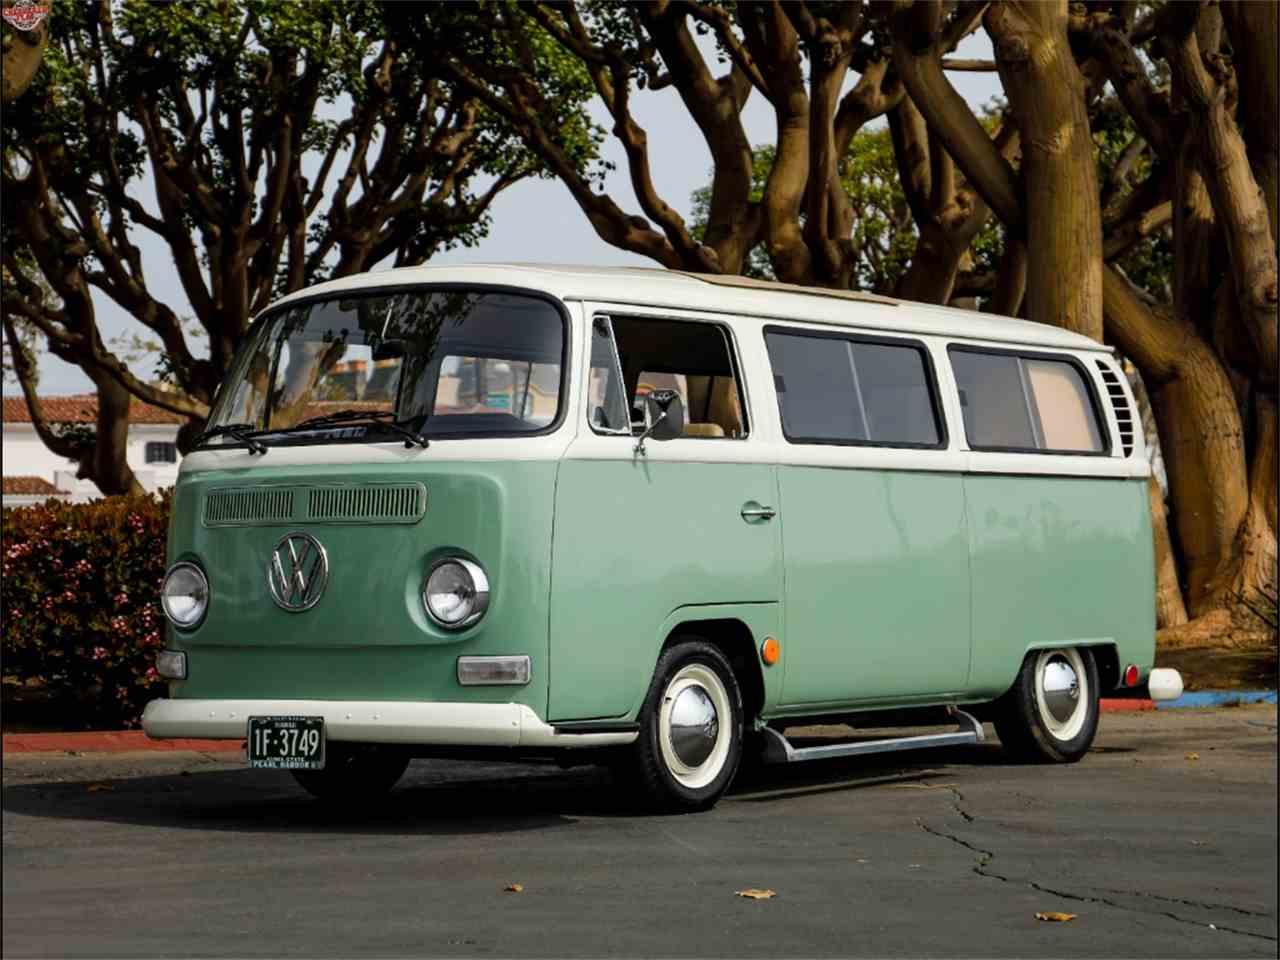 1968 Volkswagen Bus For Sale Classiccars Com Cc 1074236